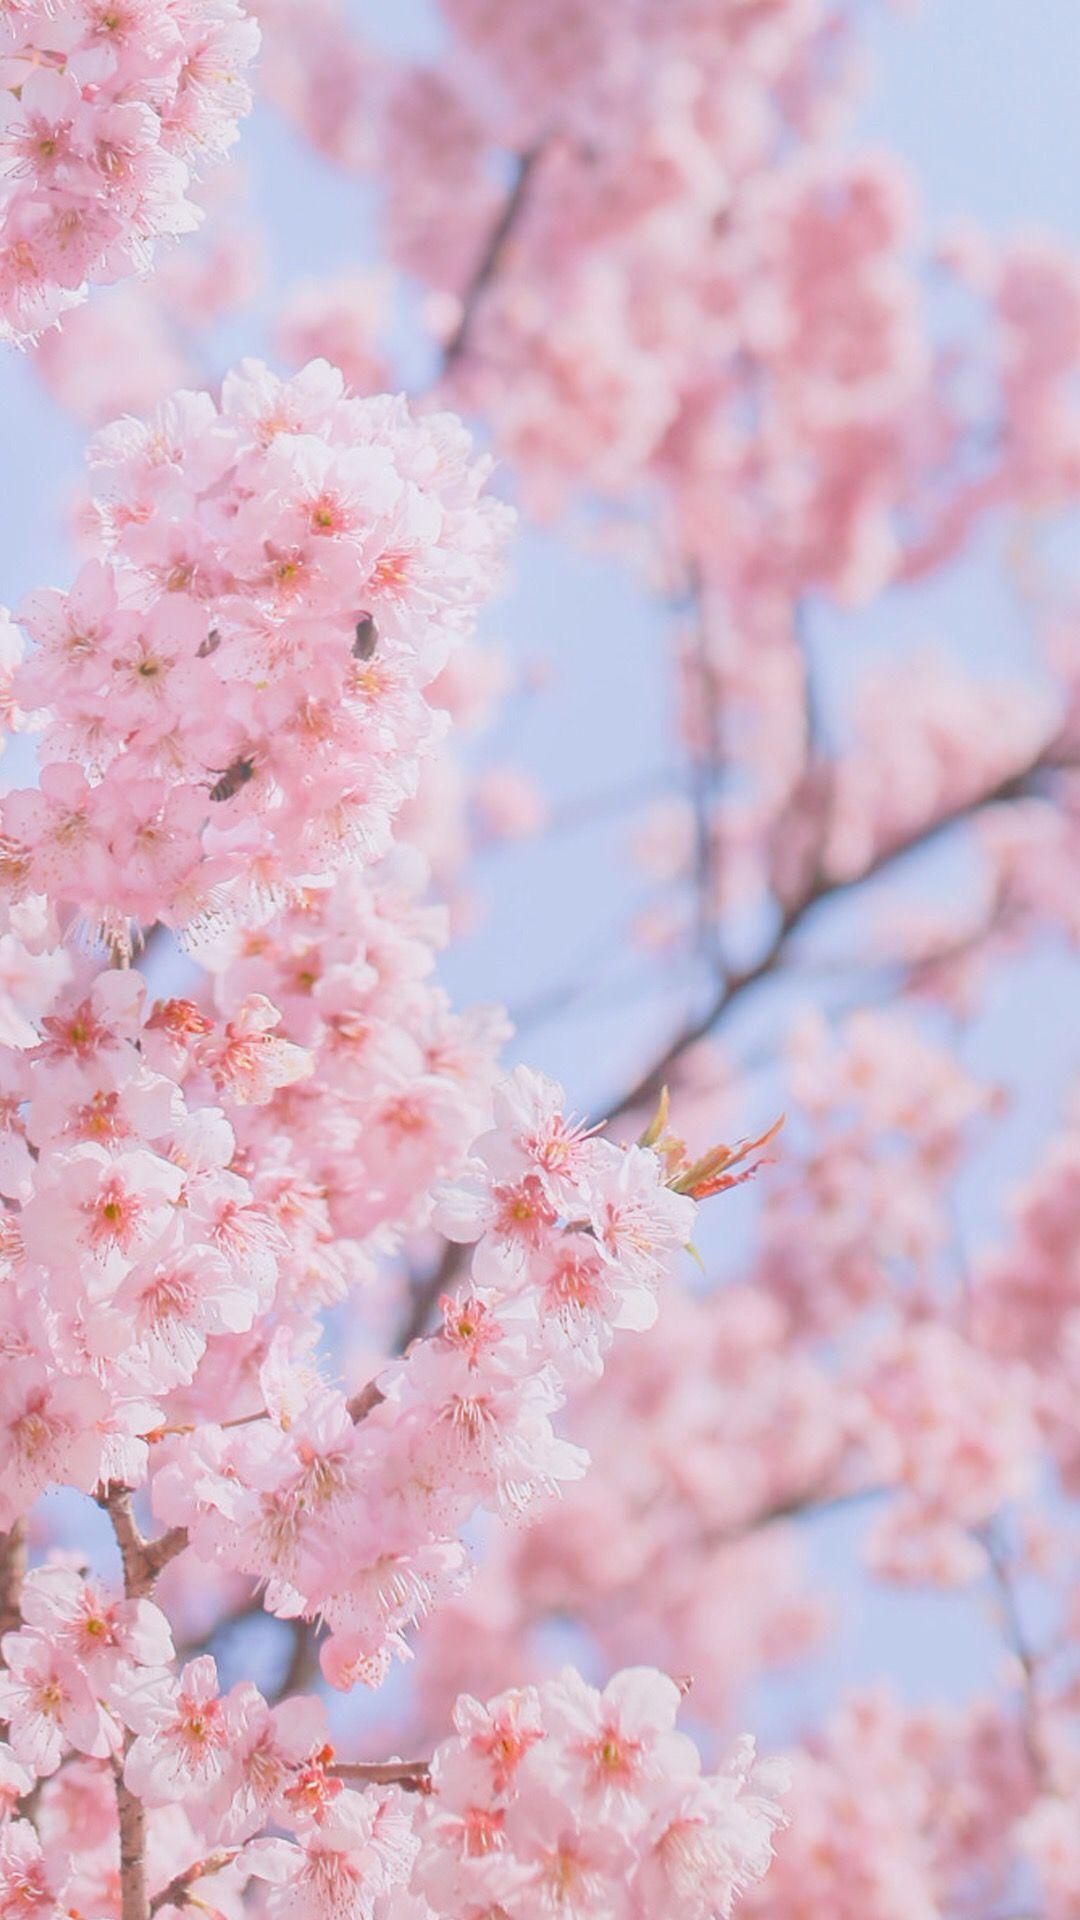 Pin By Santa Beiere On Ssl รร ɱ թeasђeʂ Aภ Sɾea๓ Cherry Blossom Wallpaper Cherry Blossom Wallpaper Iphone Beautiful Flowers Wallpapers